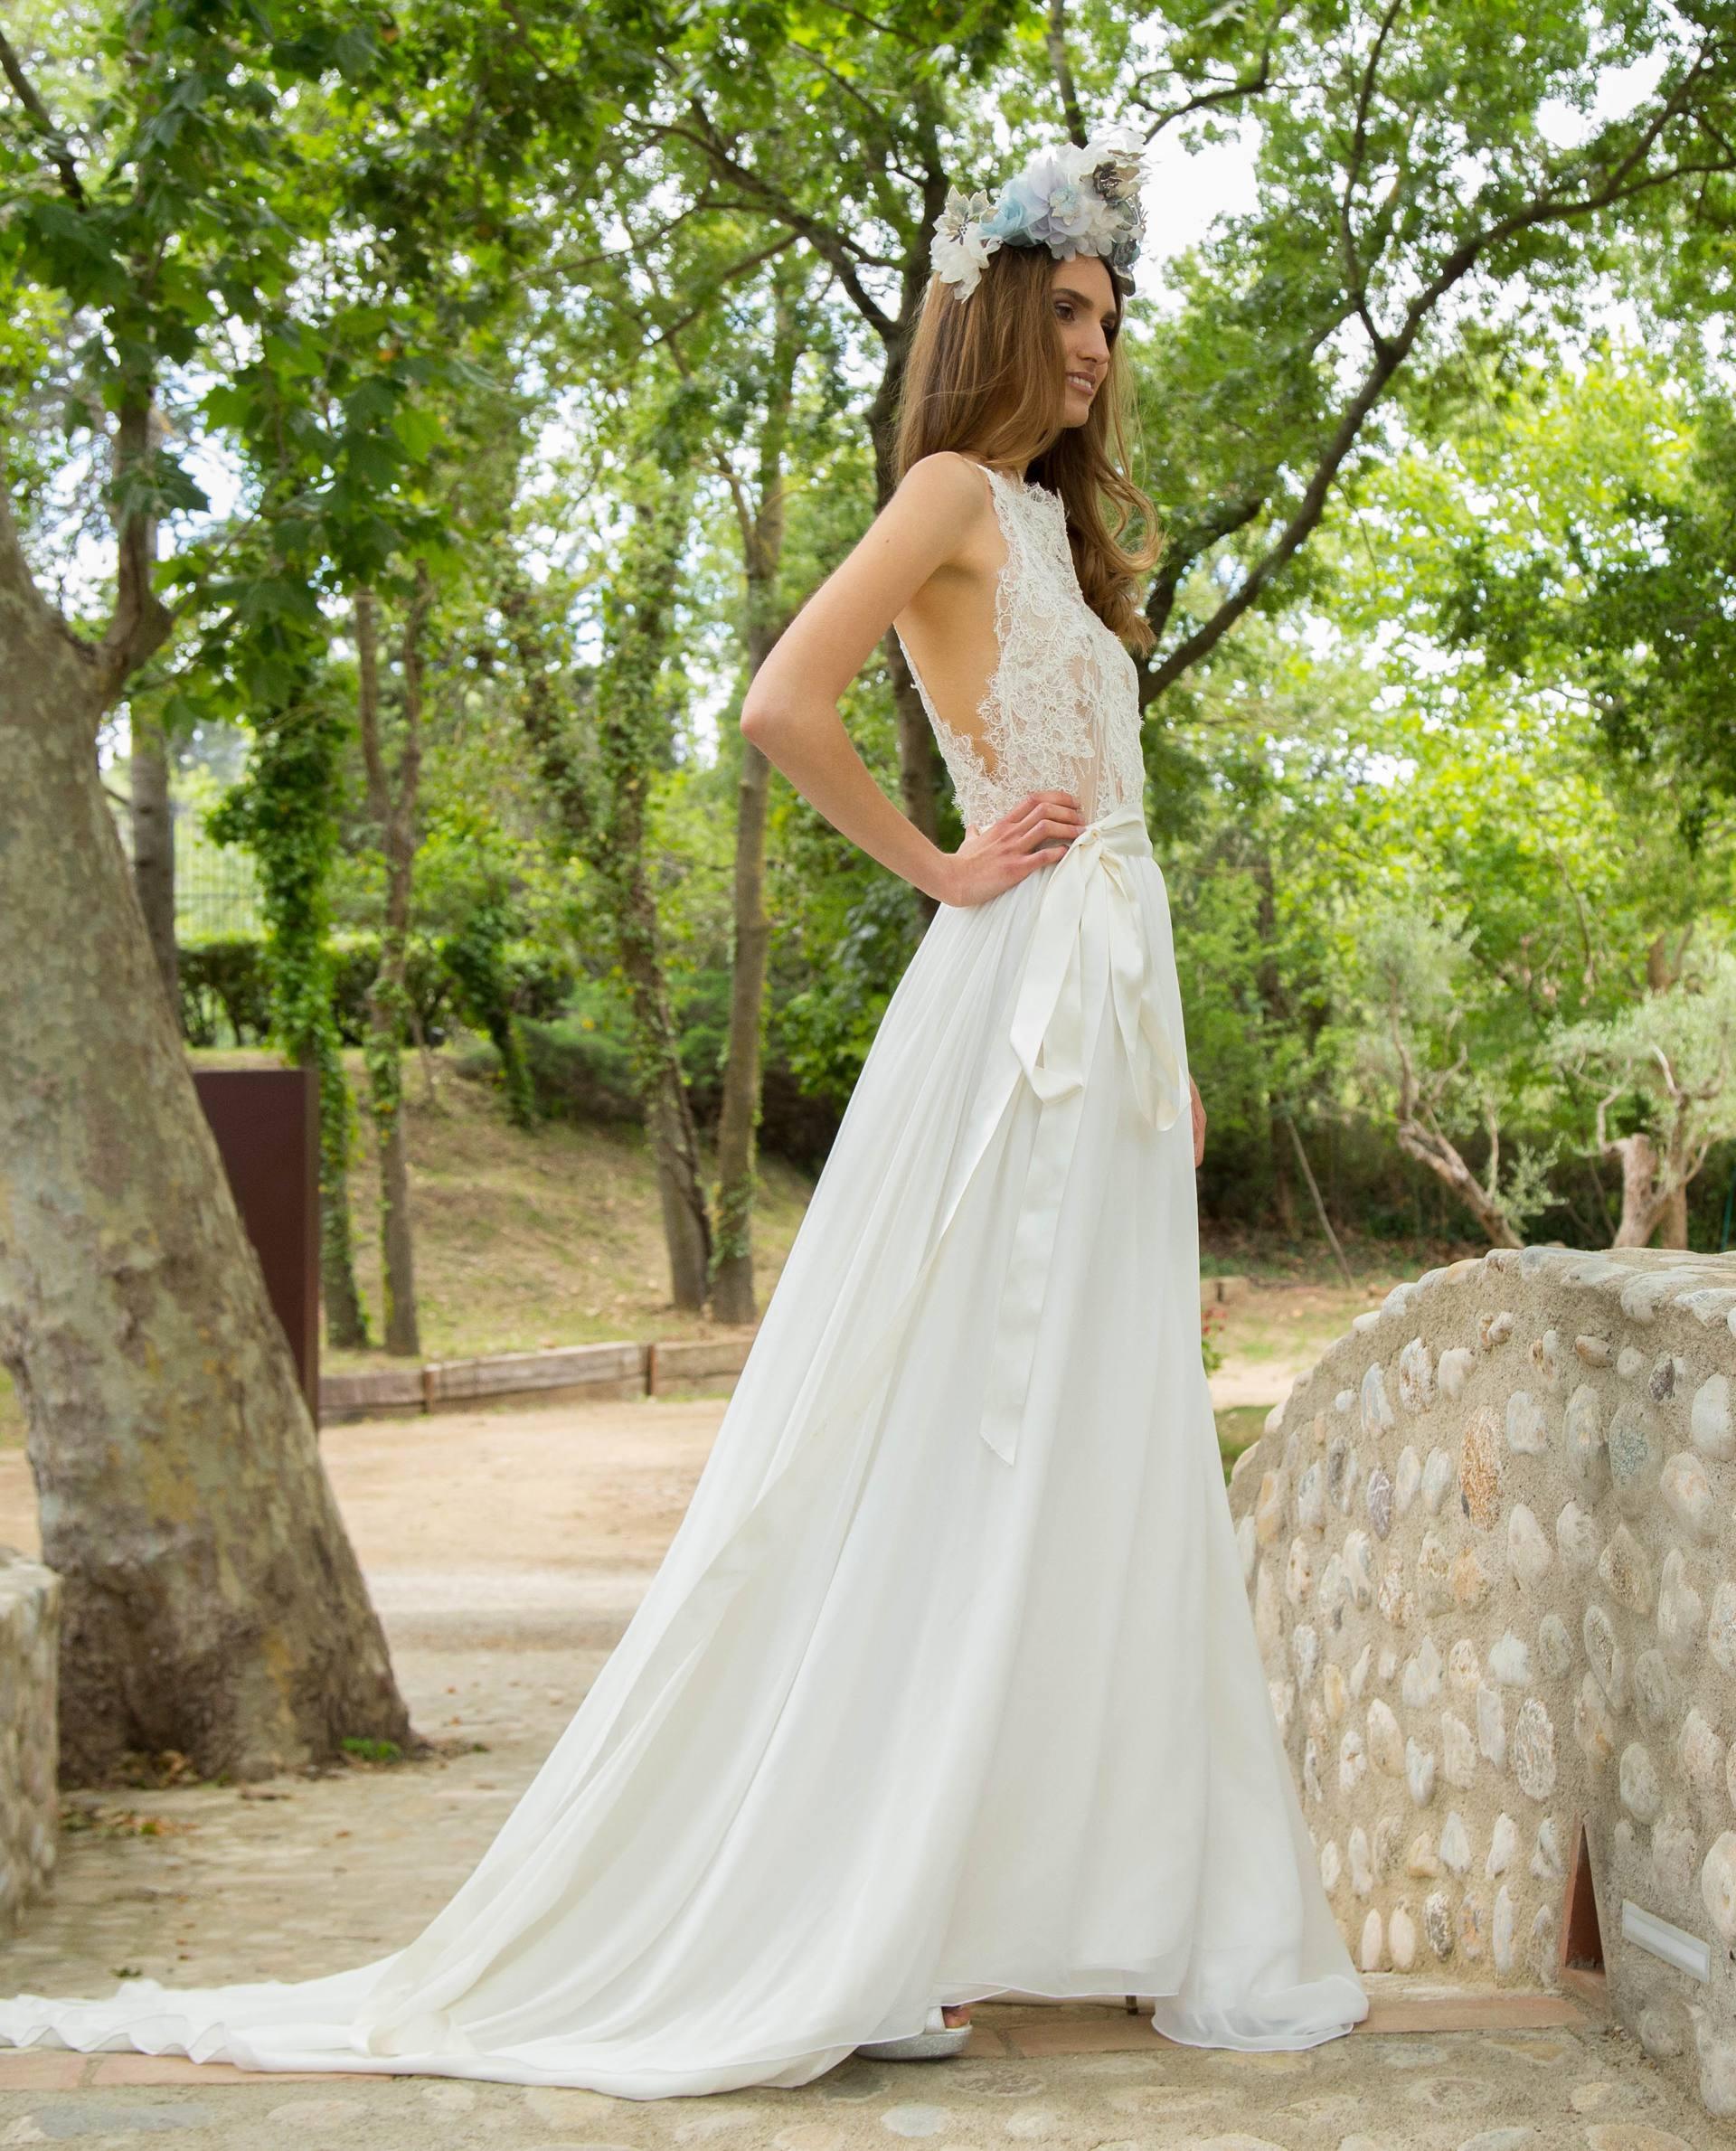 BRIDAL-NATURE 2017/18 - VESTIDOS - vestido novia Elda